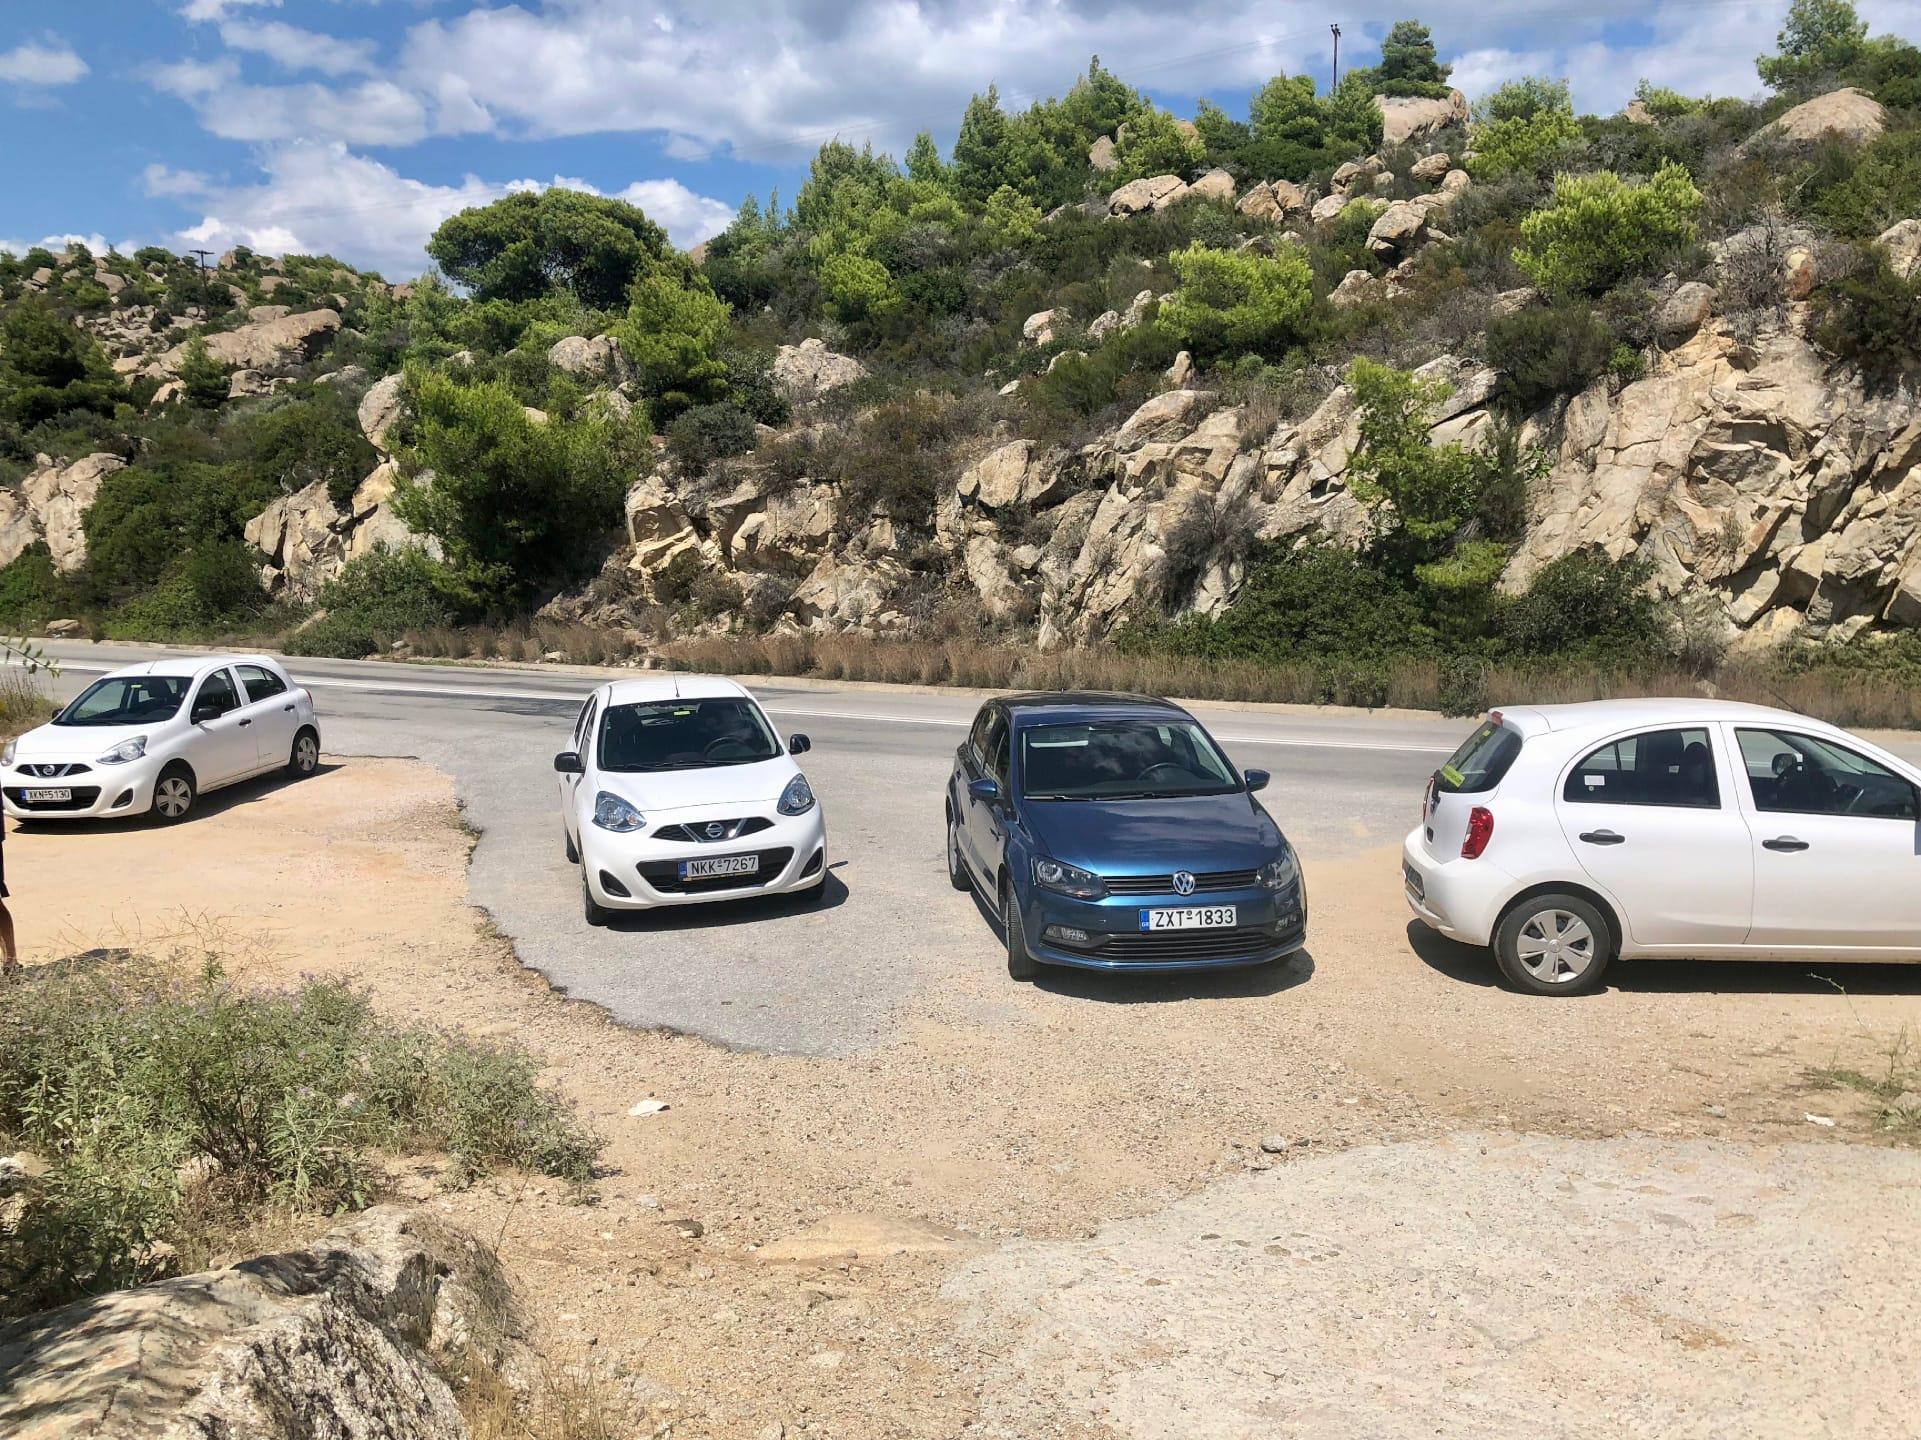 Rent a car in Greece